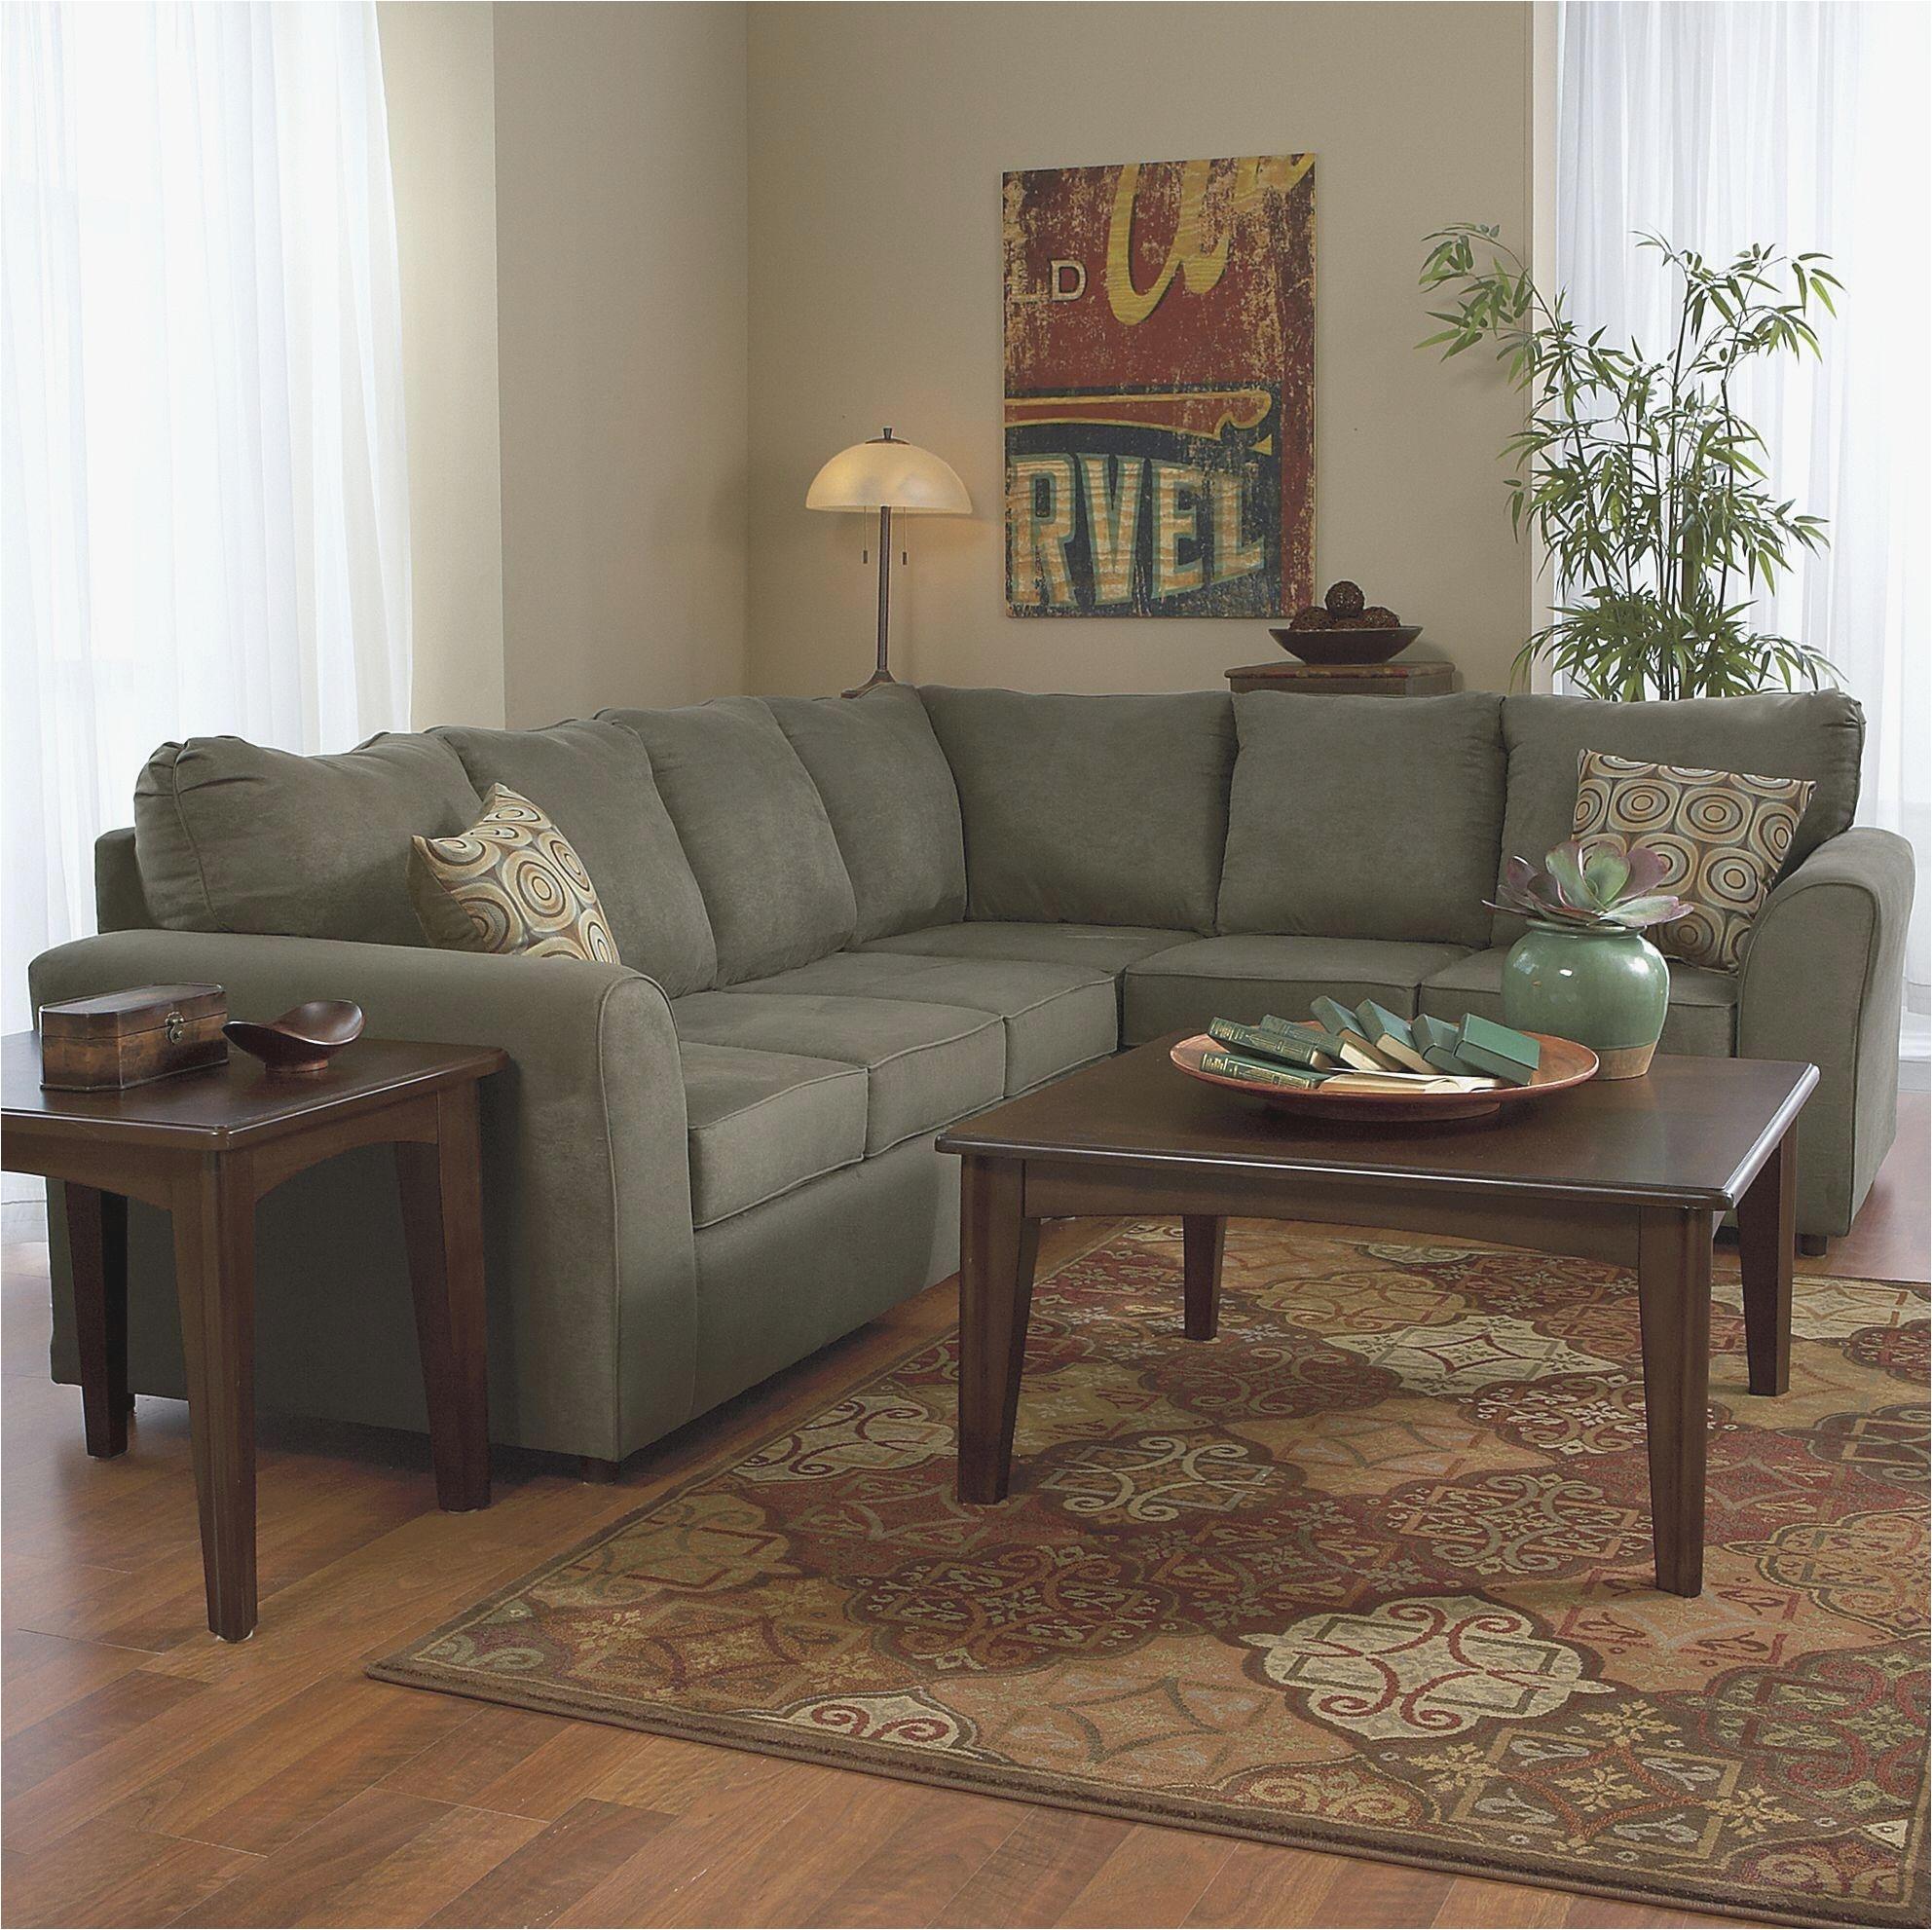 suns furniture tulsa fresh 30 top patio furniture line ideas onionskeen